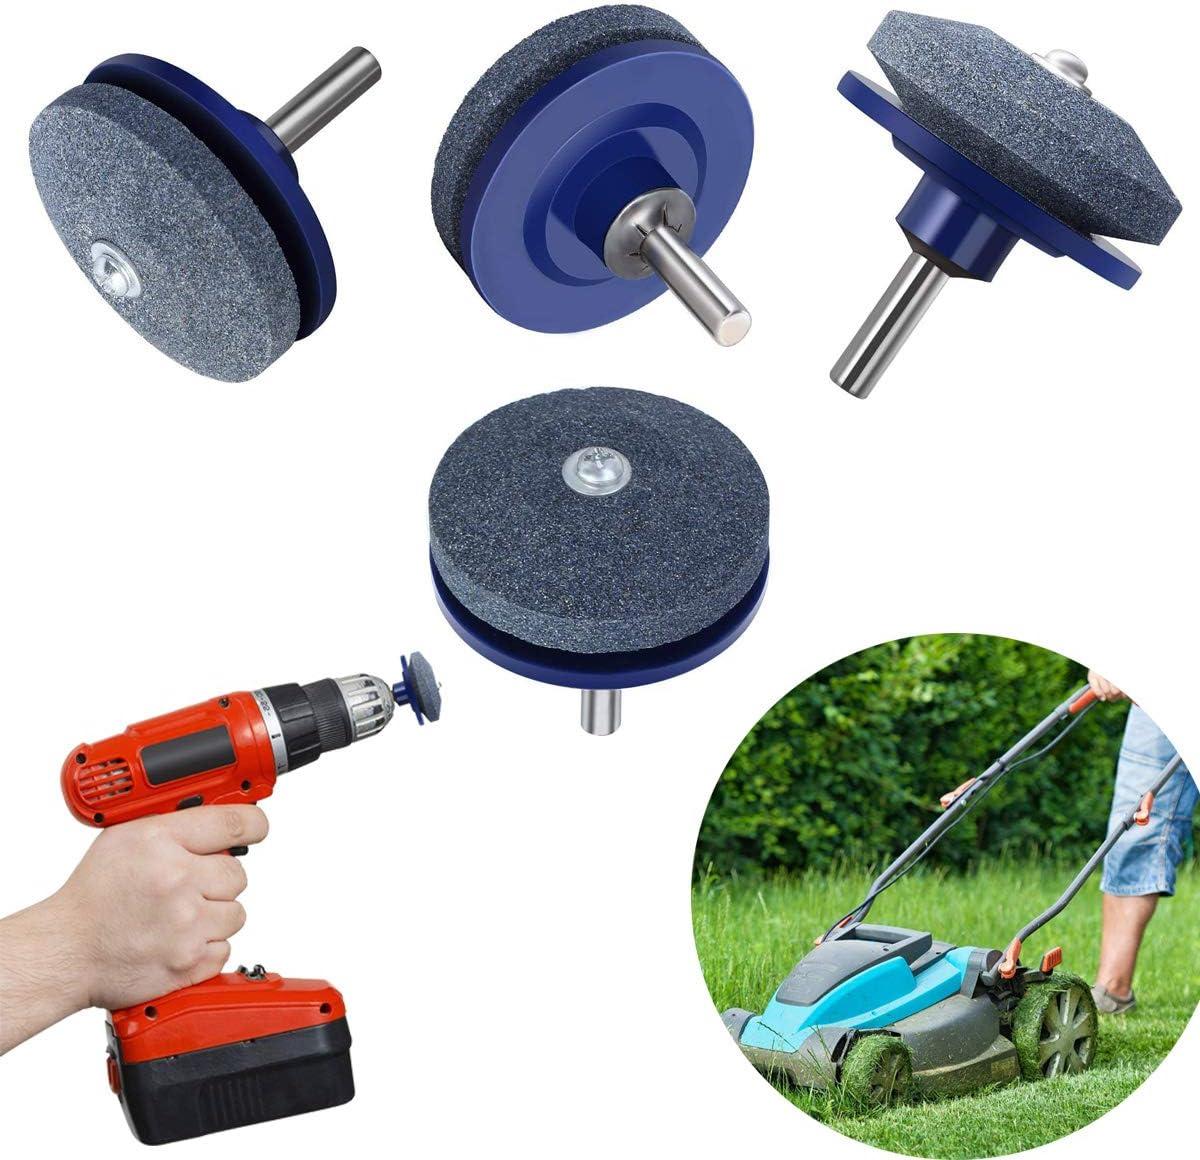 Axes Shears Spades Lawn Mower Blade Sharpener Garden Tools Lawn-Edgers 1PCS for Rotary Lawn Mower